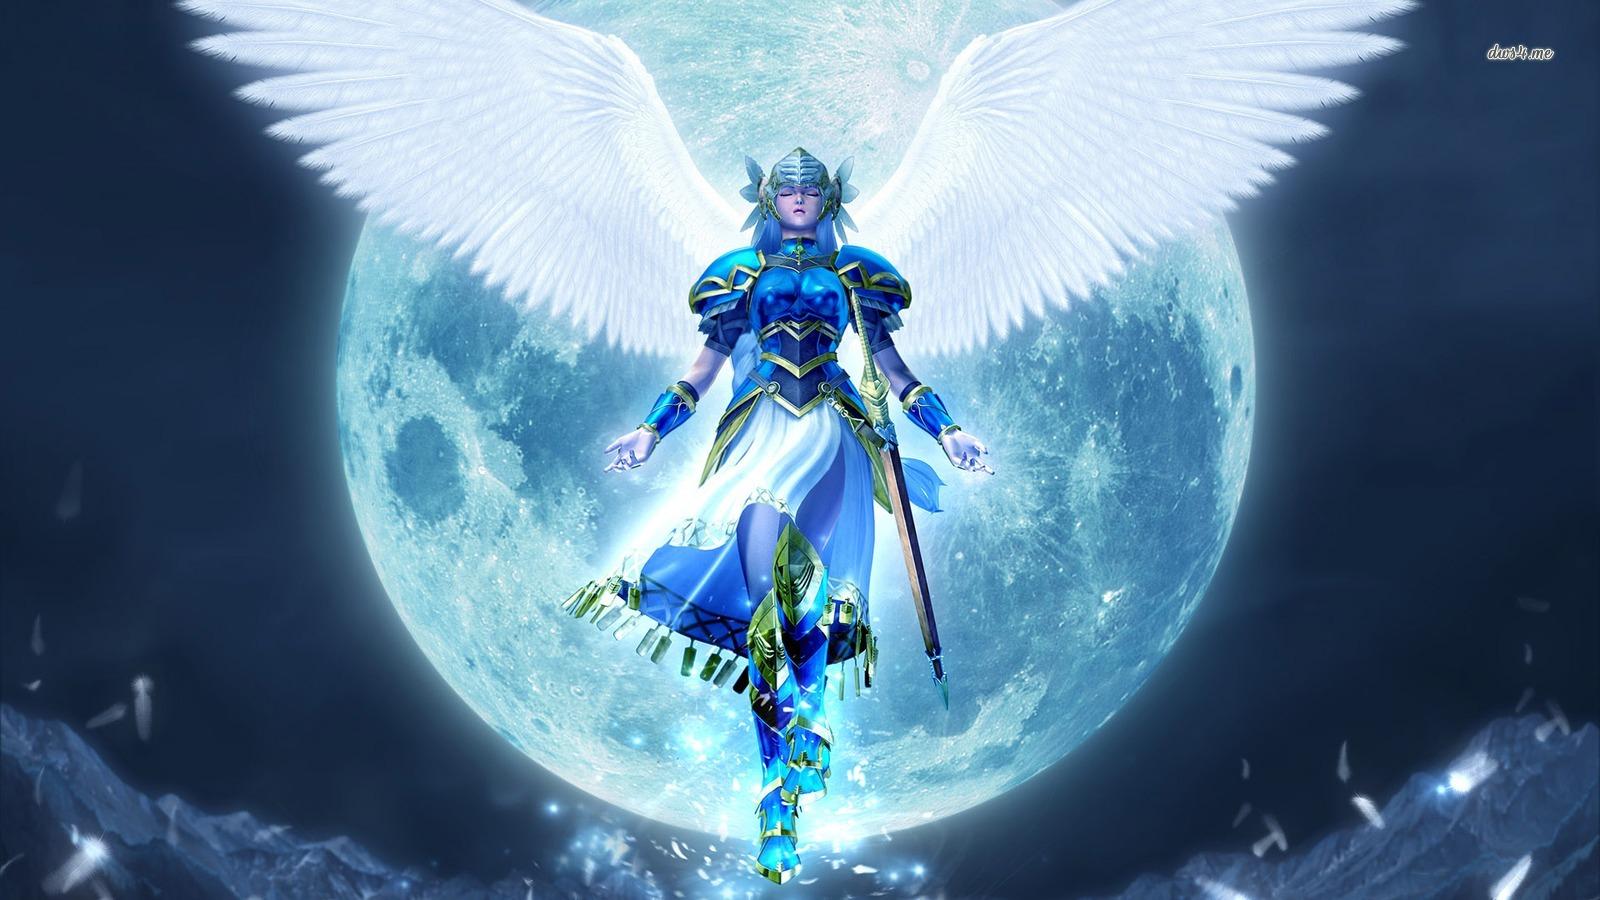 Man And Woman Angels Warrior HD Wallpaper